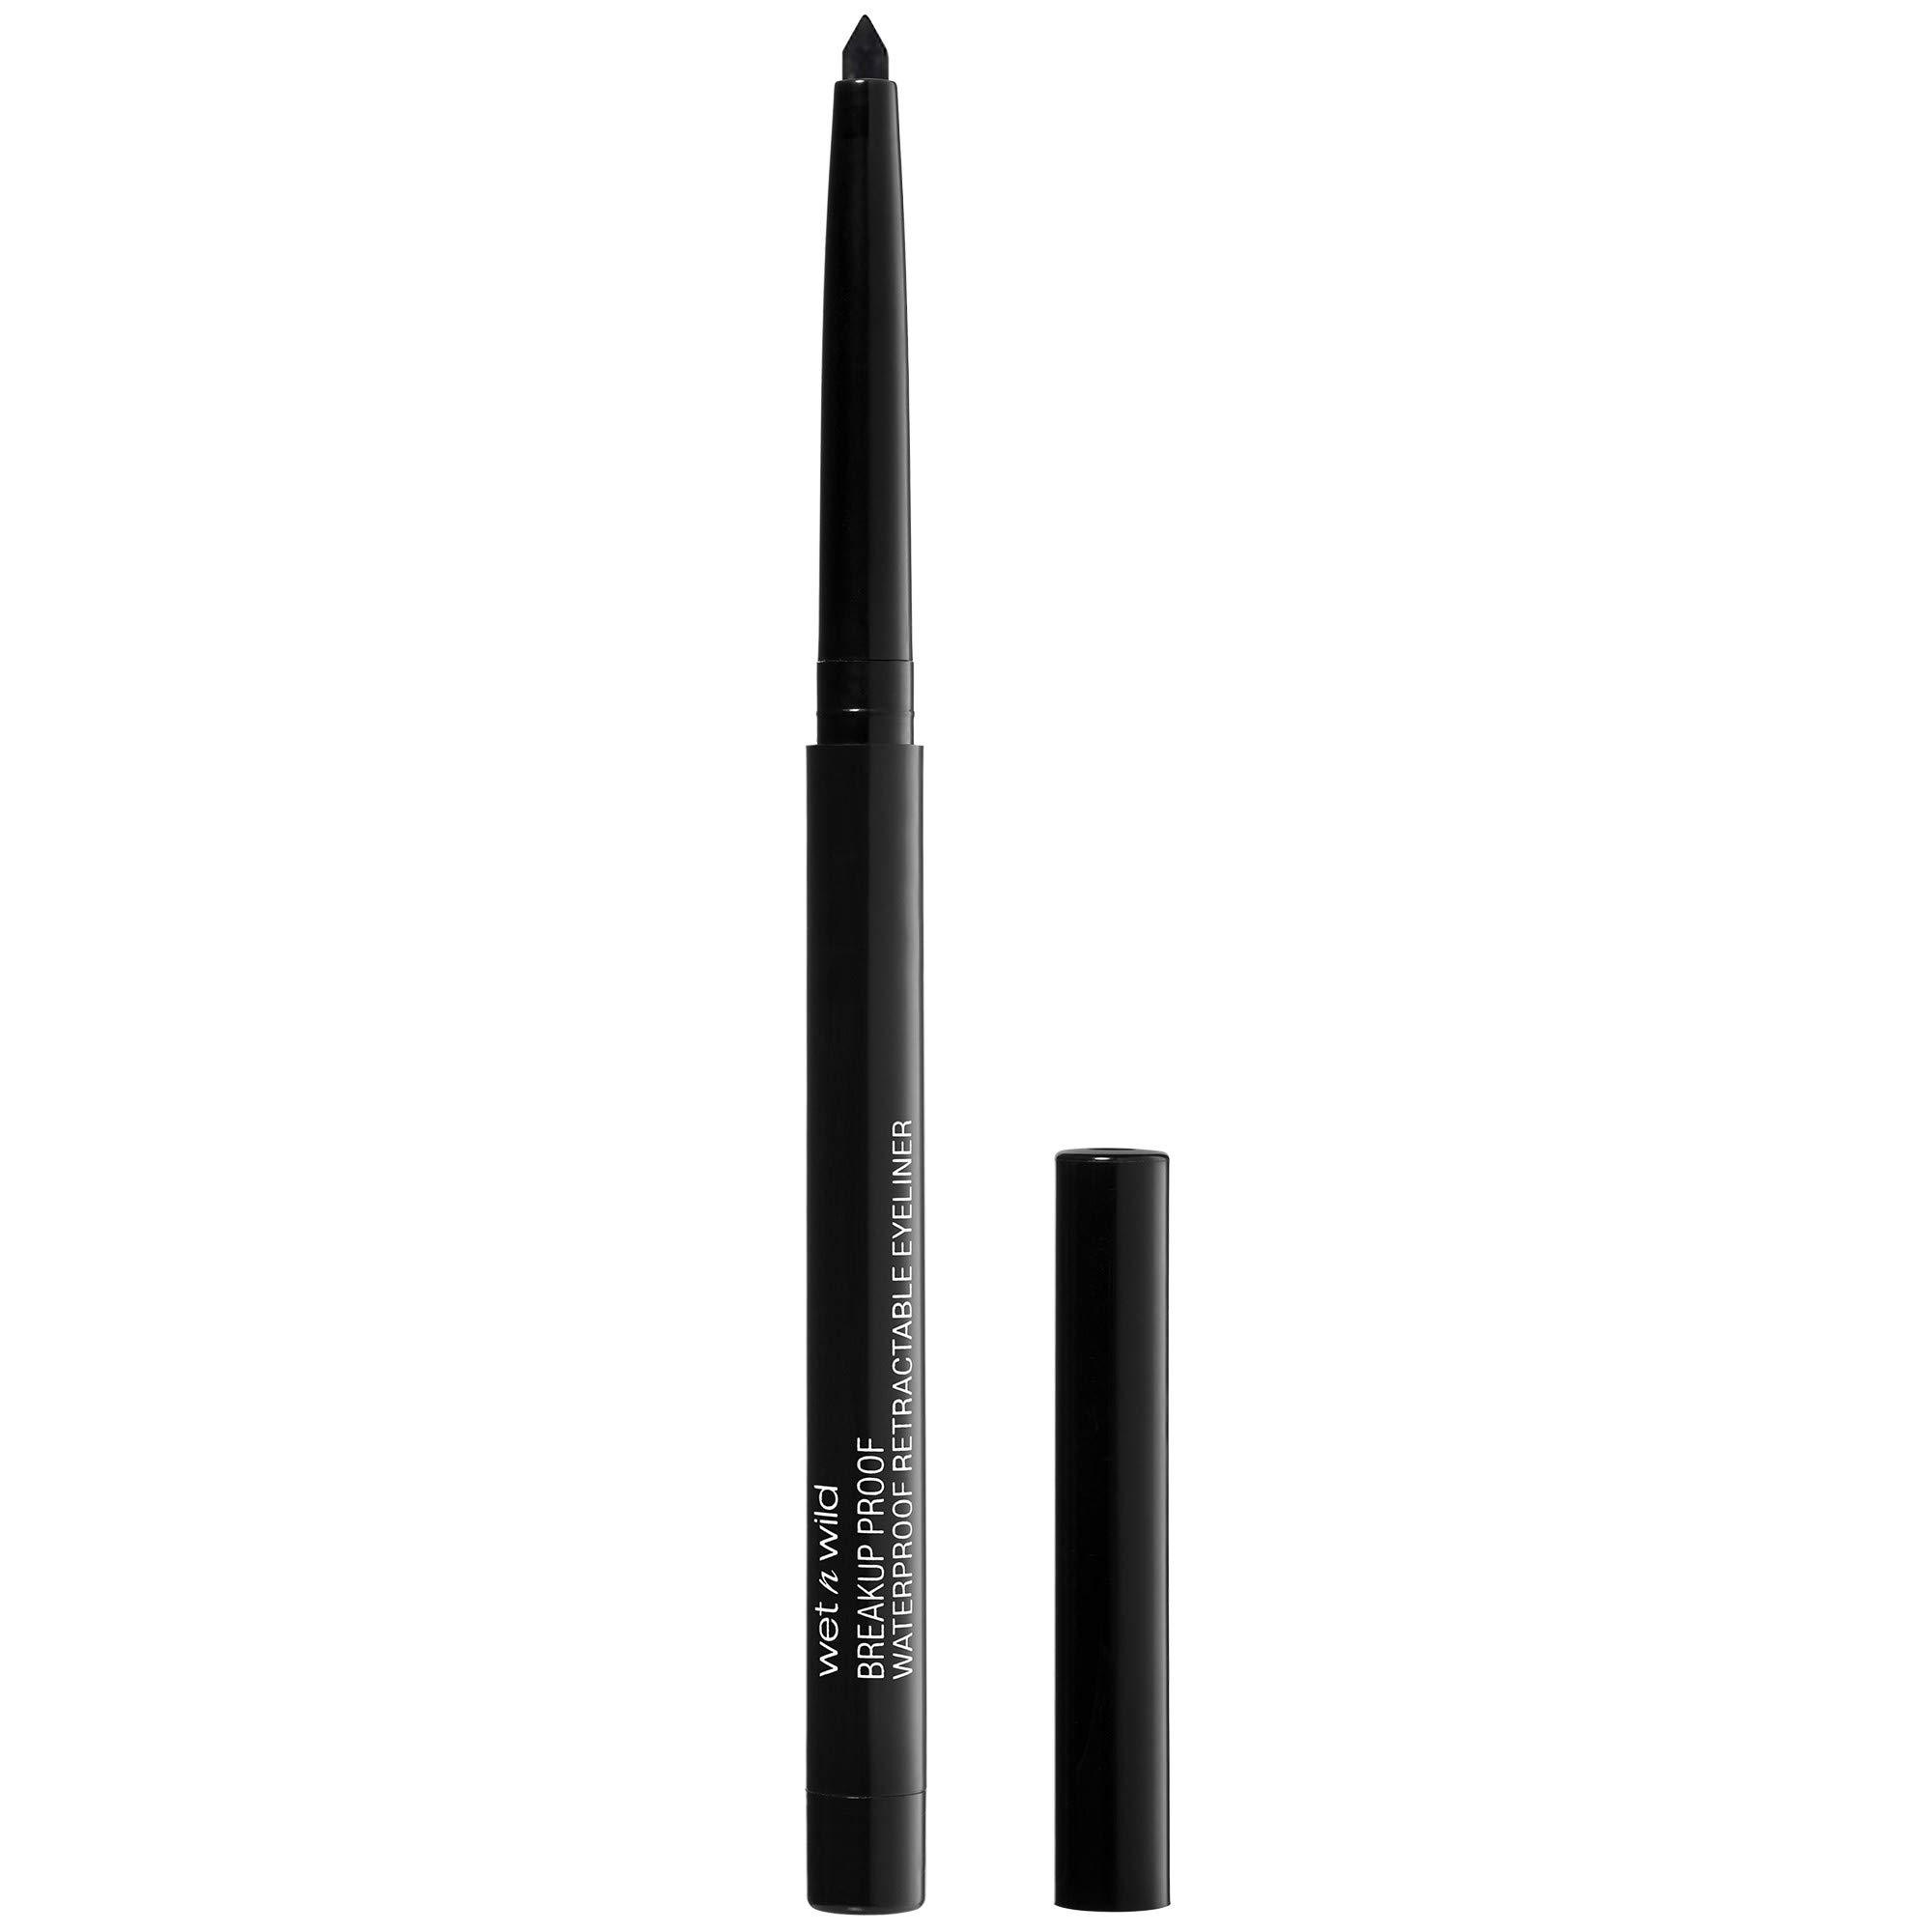 wet n wild Mega last breakup-proof retractable eyeliner, Blackest Black, 0.01 Ounce